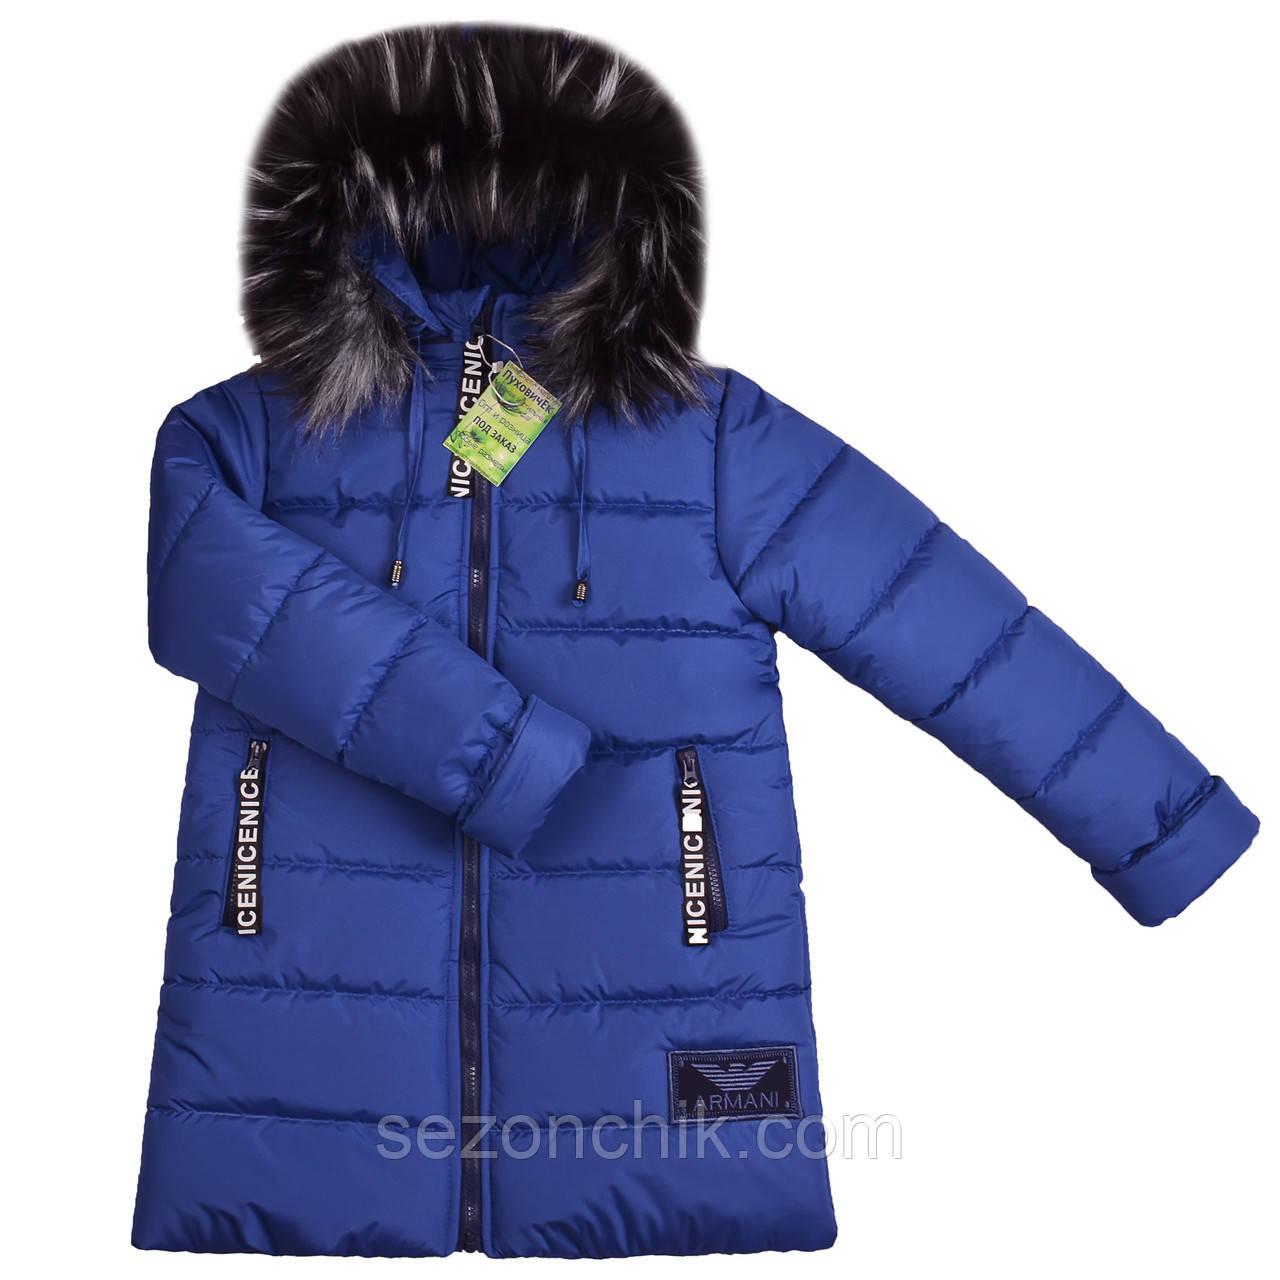 Зимний пуховик для девочки от производителя с мехом